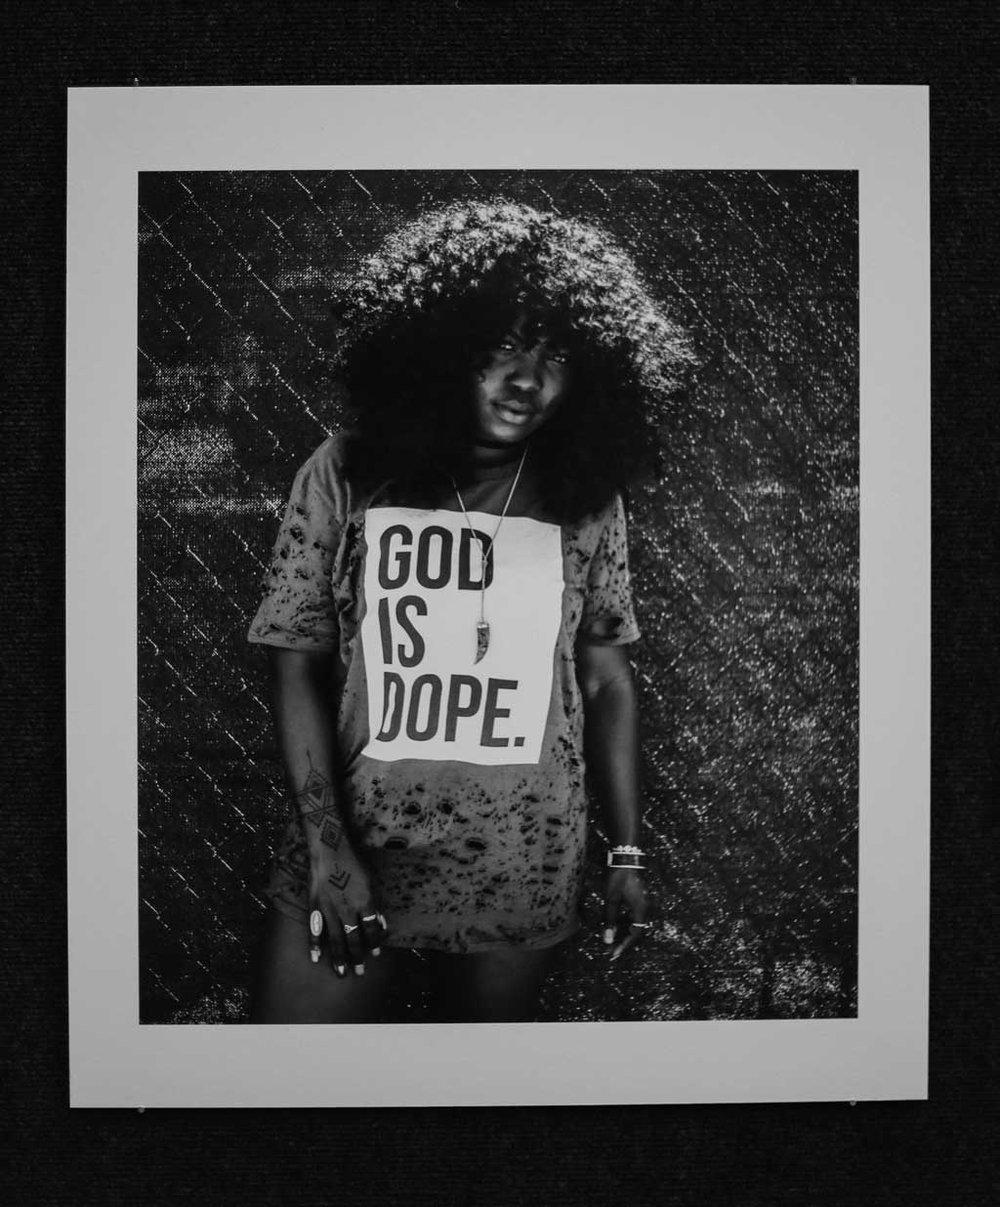 """Praise.""  Jessica Rycheal. Digital photograph, 2016."